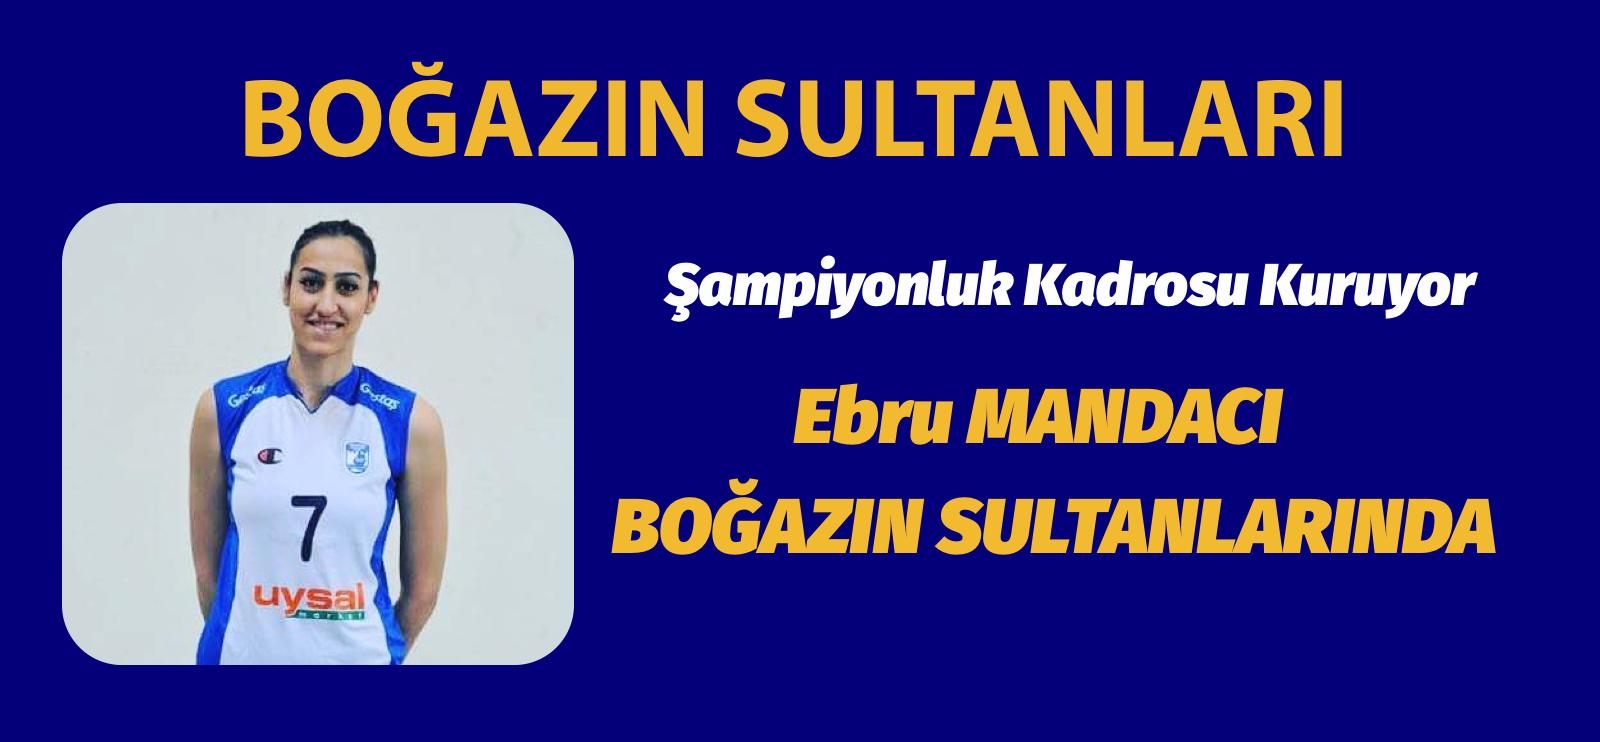 Ebru MANDACI BOĞAZIN SULTANLARINDA